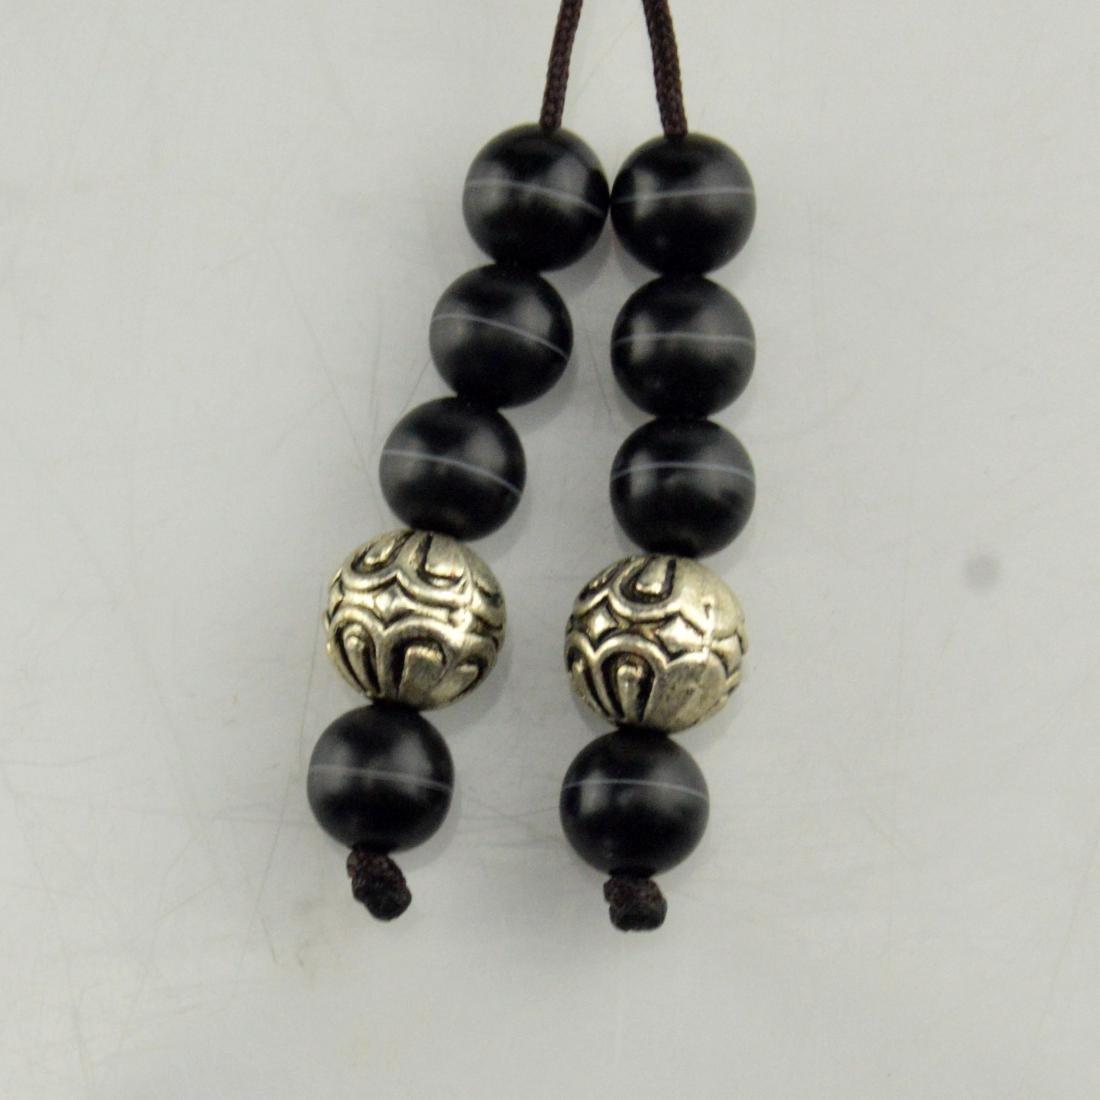 Medicine Buddha necklace - 3